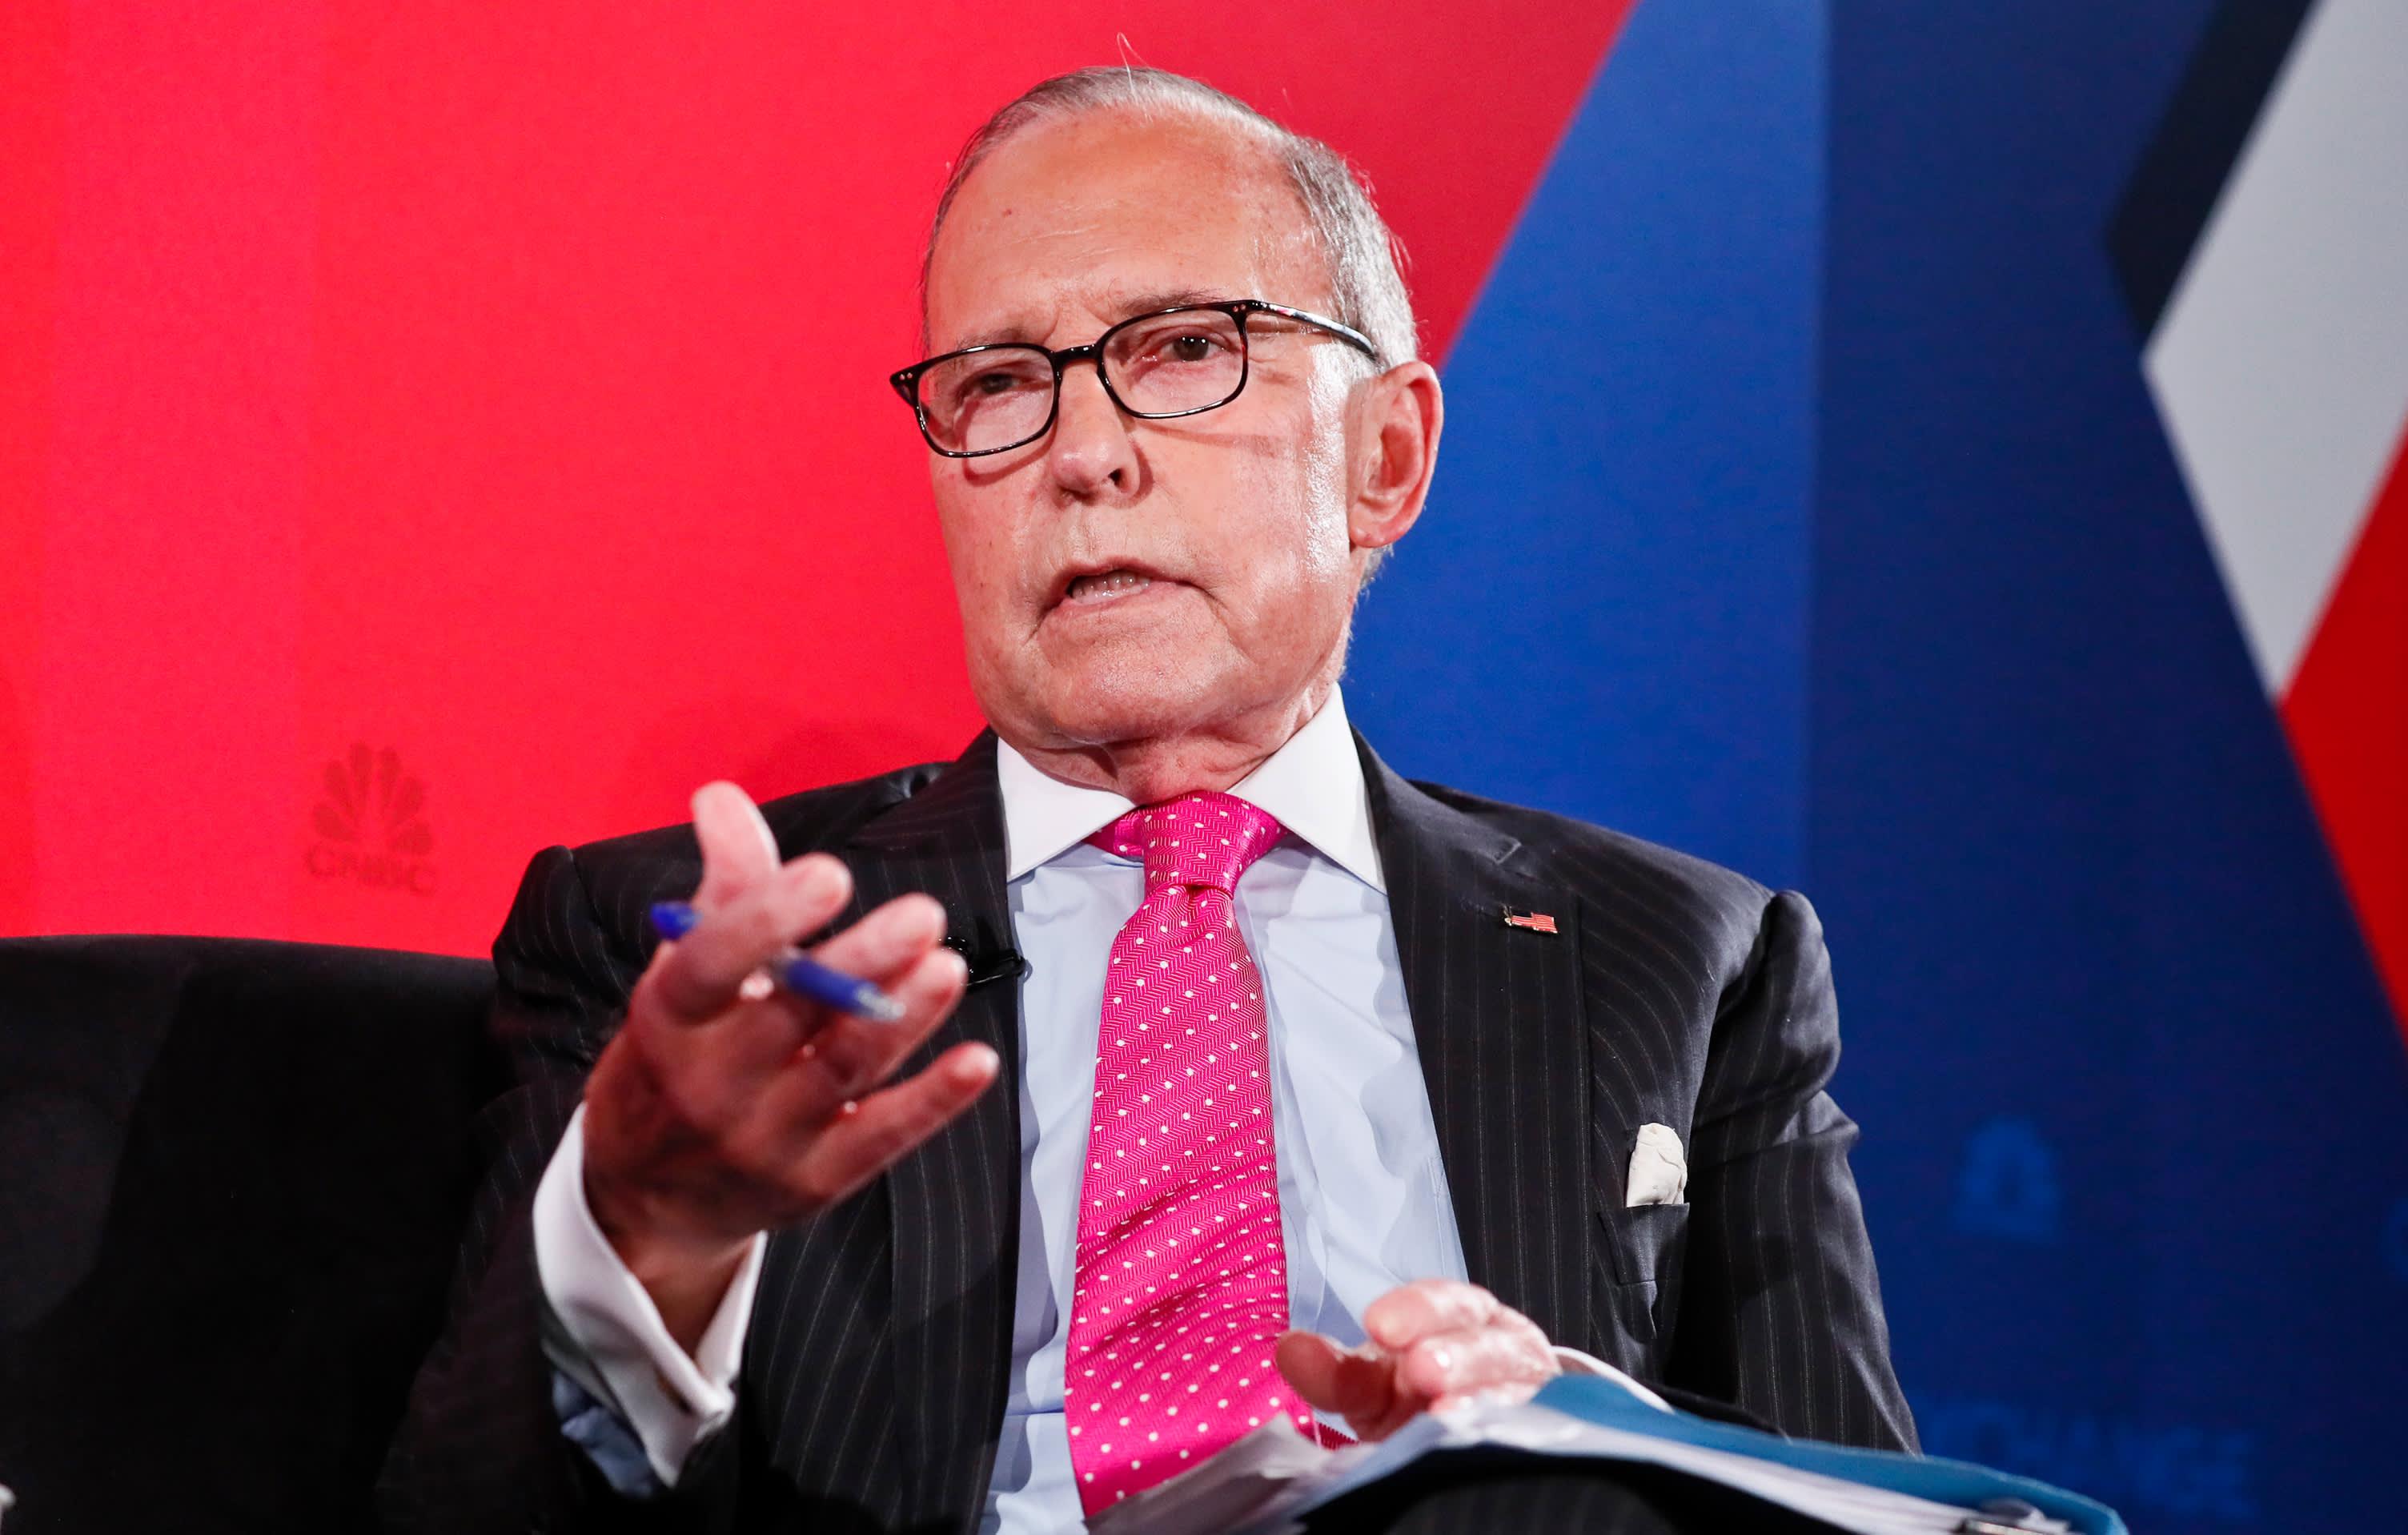 White House top economic advisor Larry Kudlow says economic growth will top 3% this year